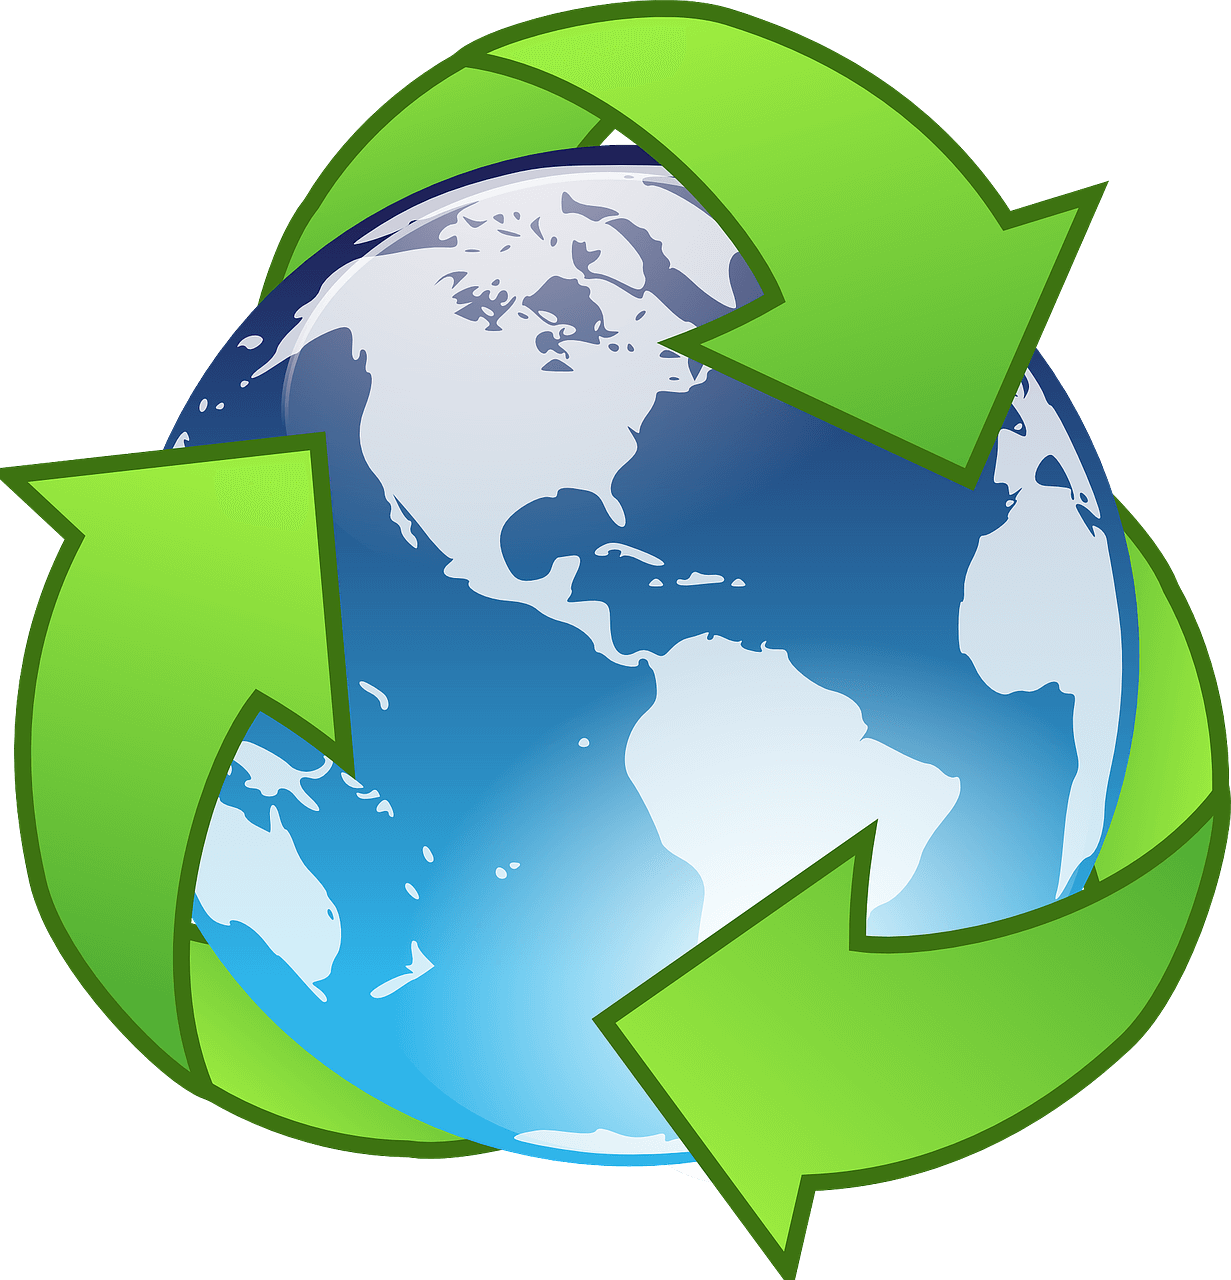 Easy Ways To Be More Environmentally Conscious